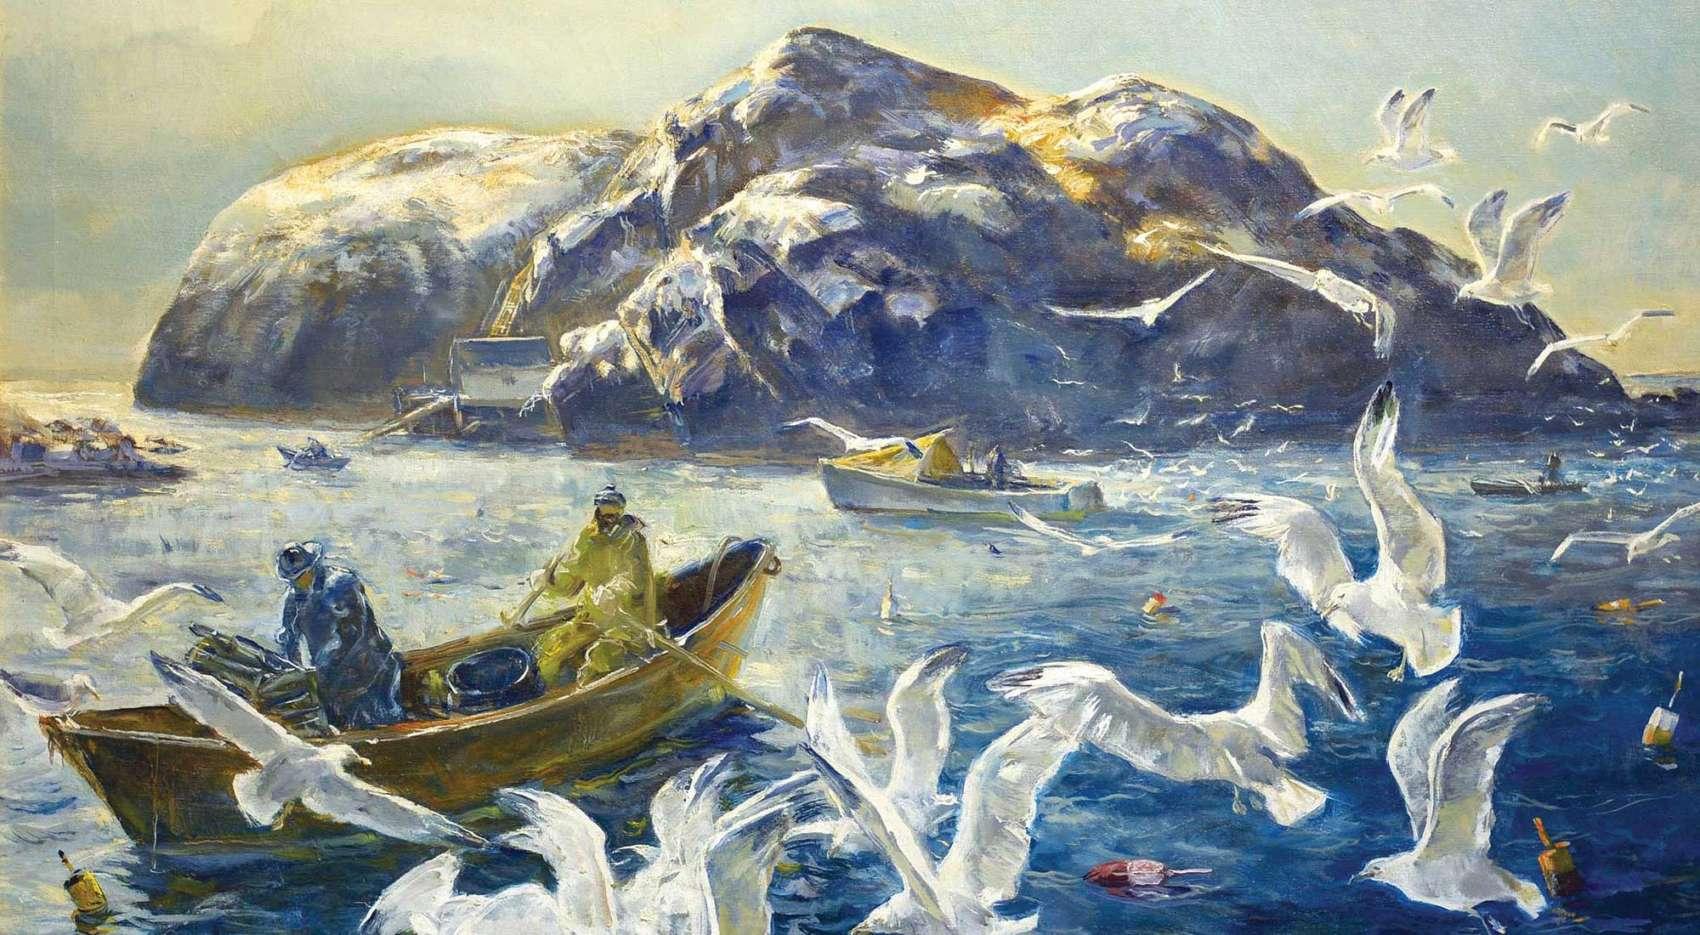 Andrew Winter Morning Haul off Manana